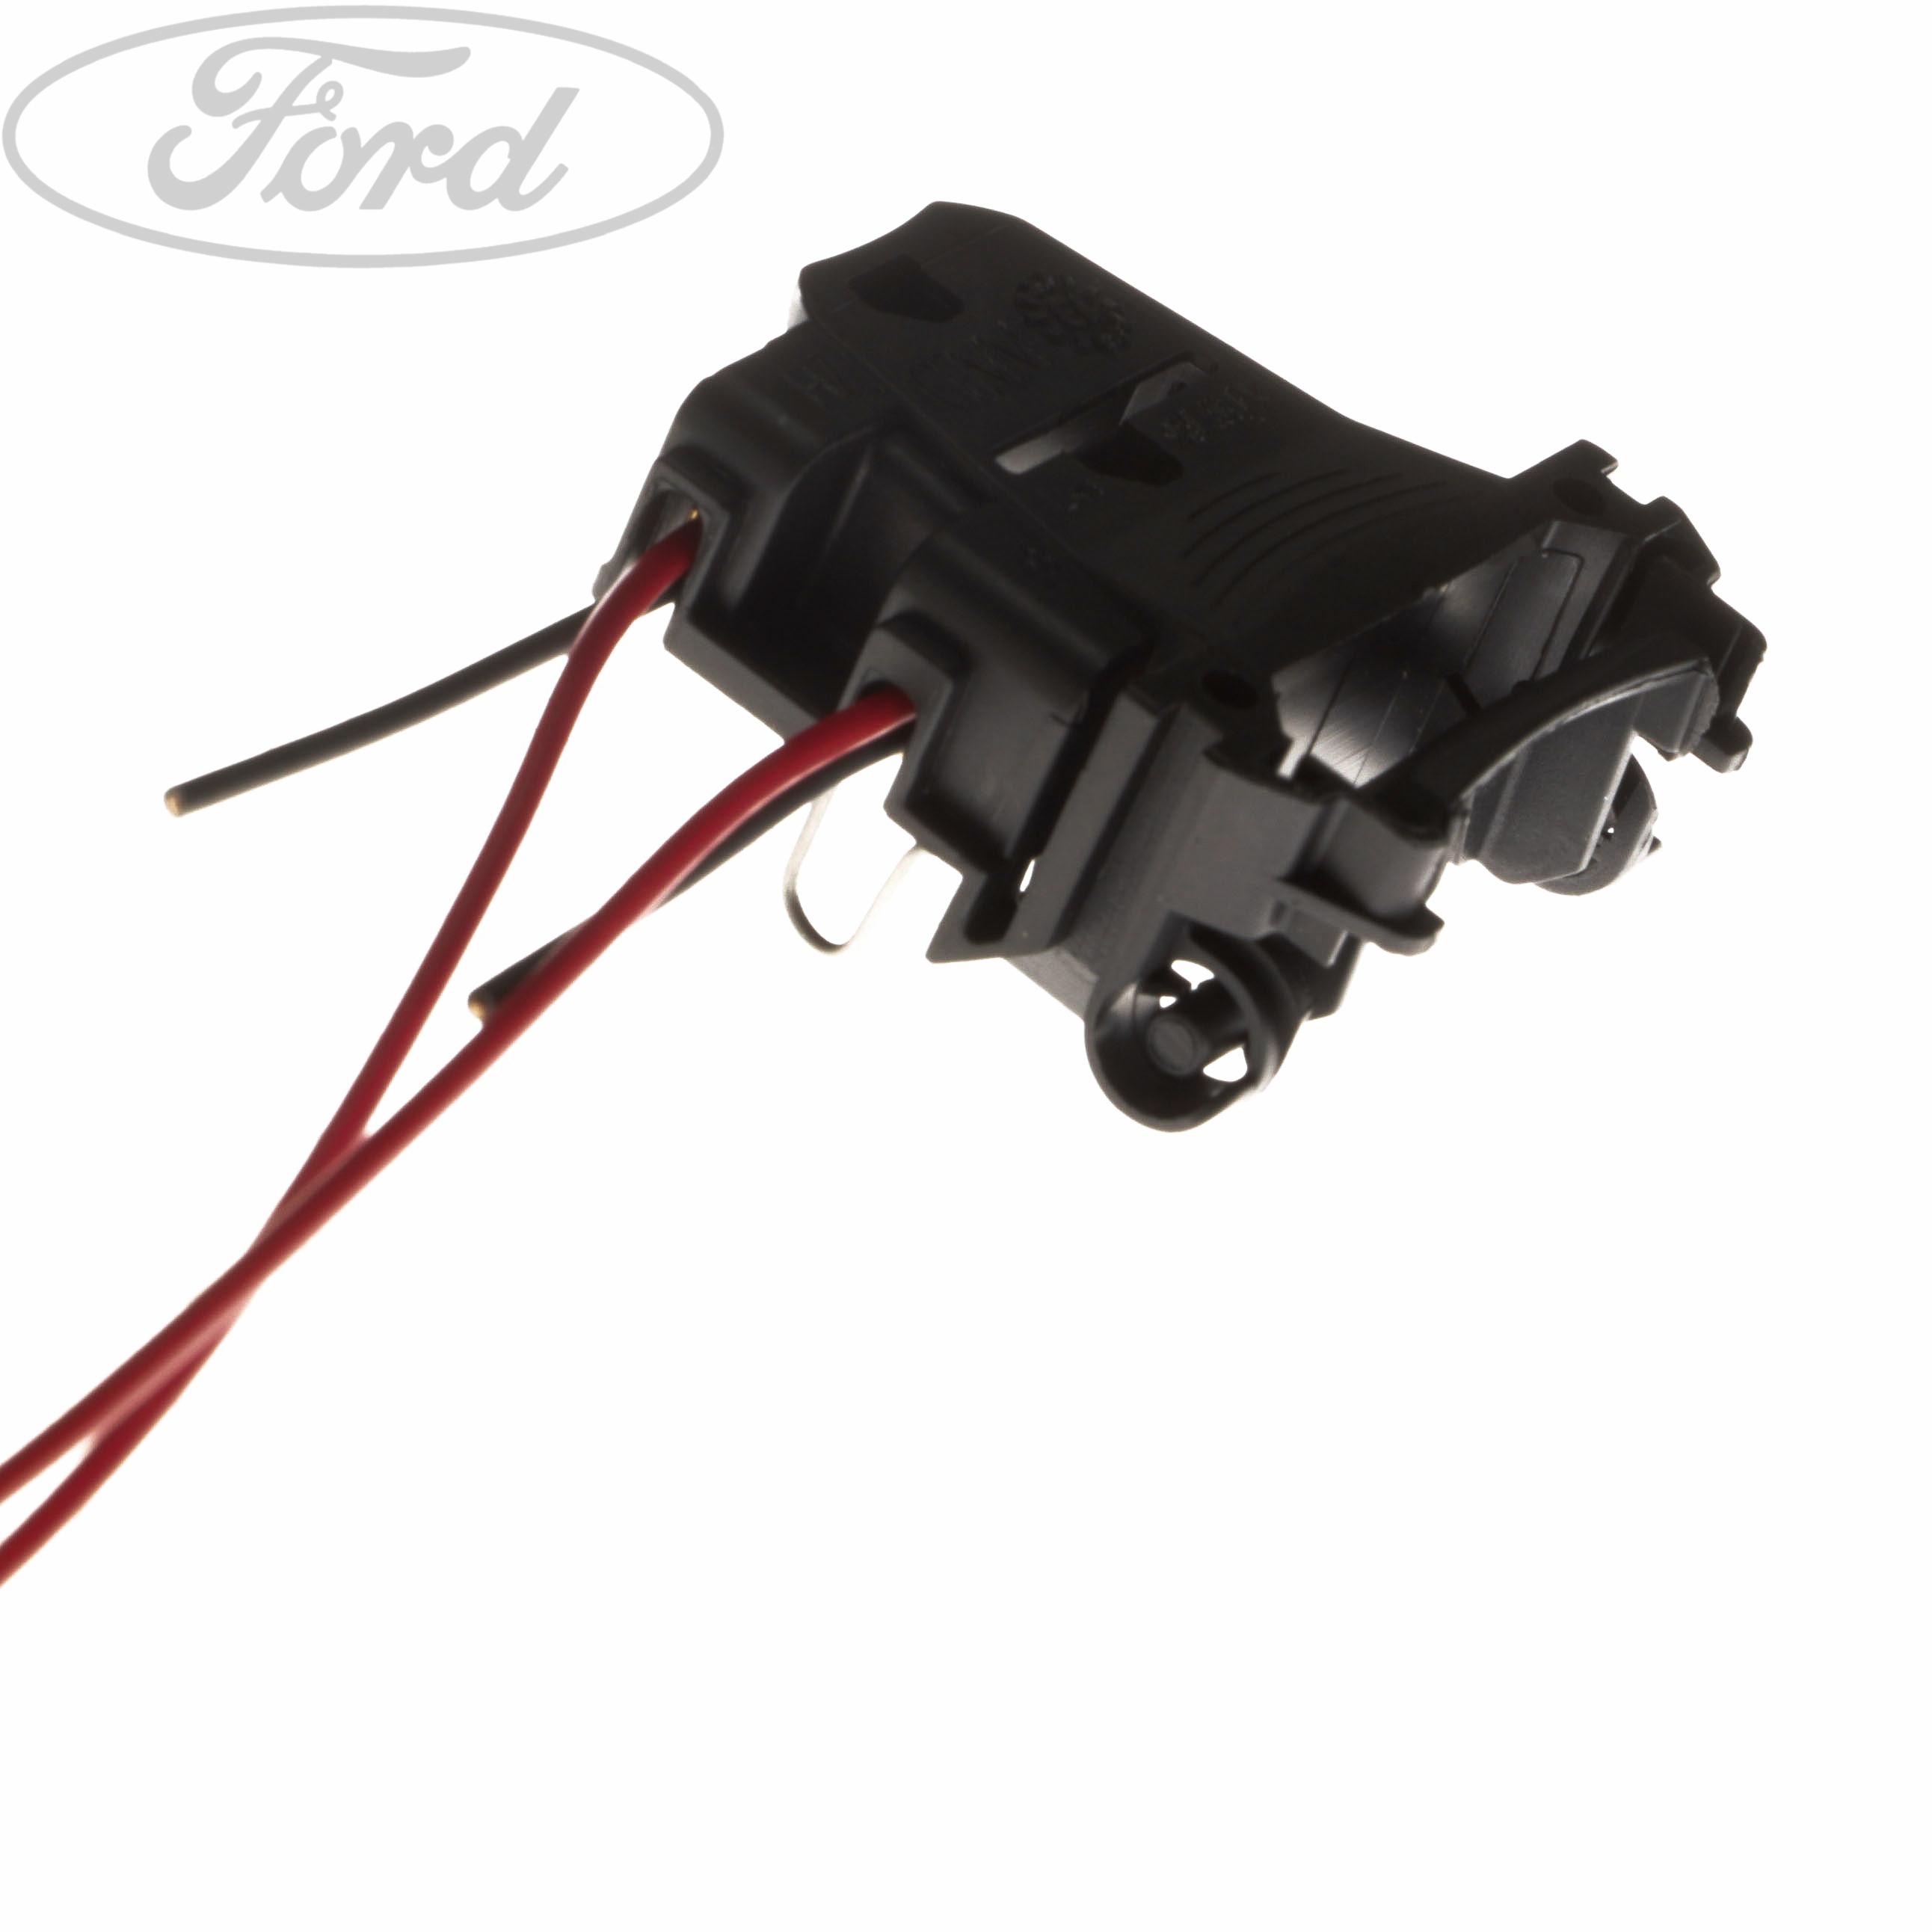 Image Result For Ford Kuga Engine Problems